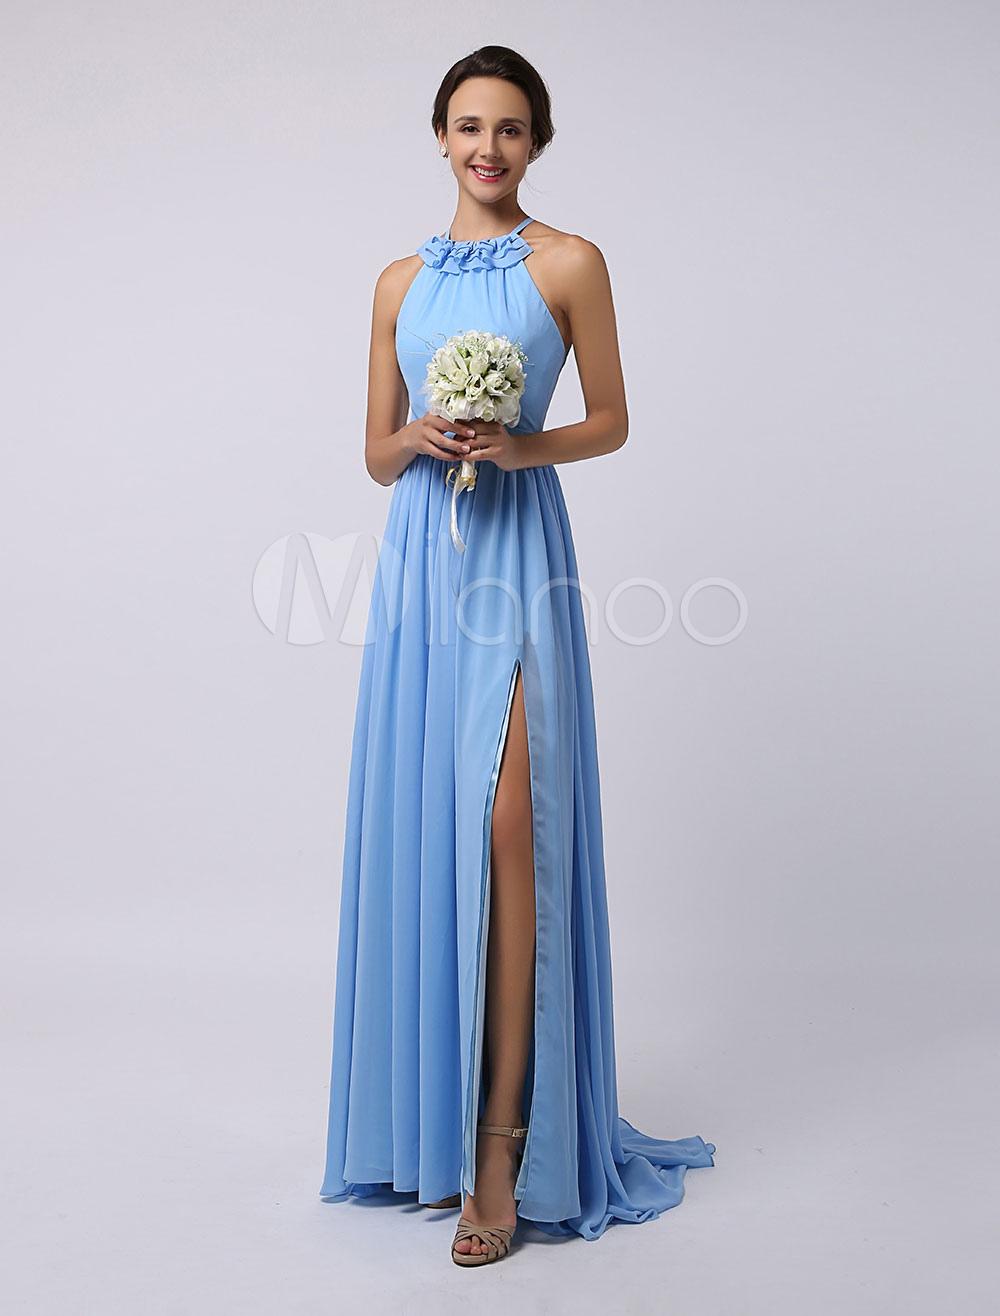 cbfa0df476 vestido de dama de honor 2019